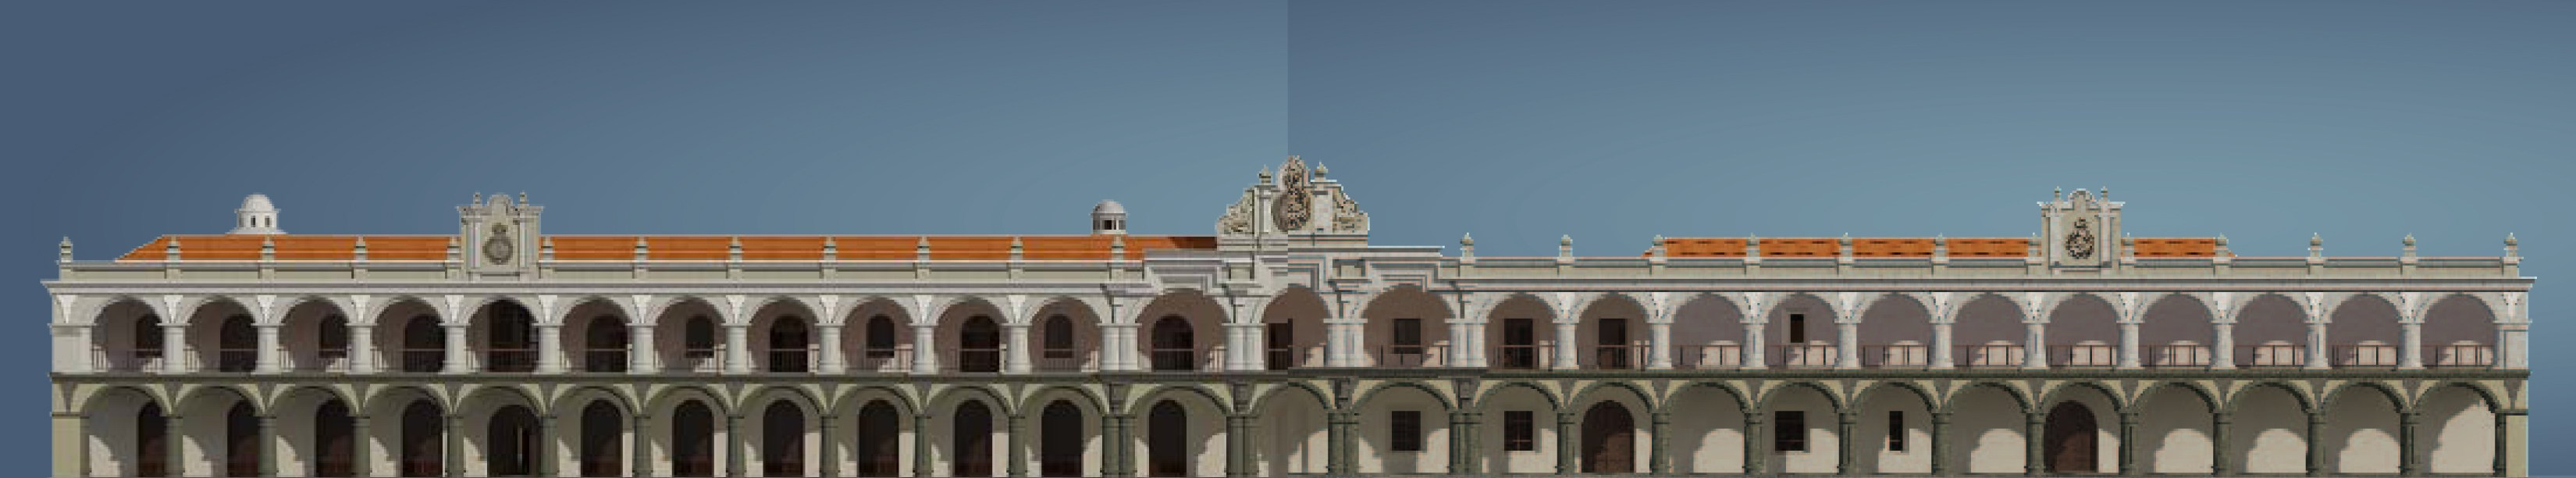 GuiaRealPalacio-8